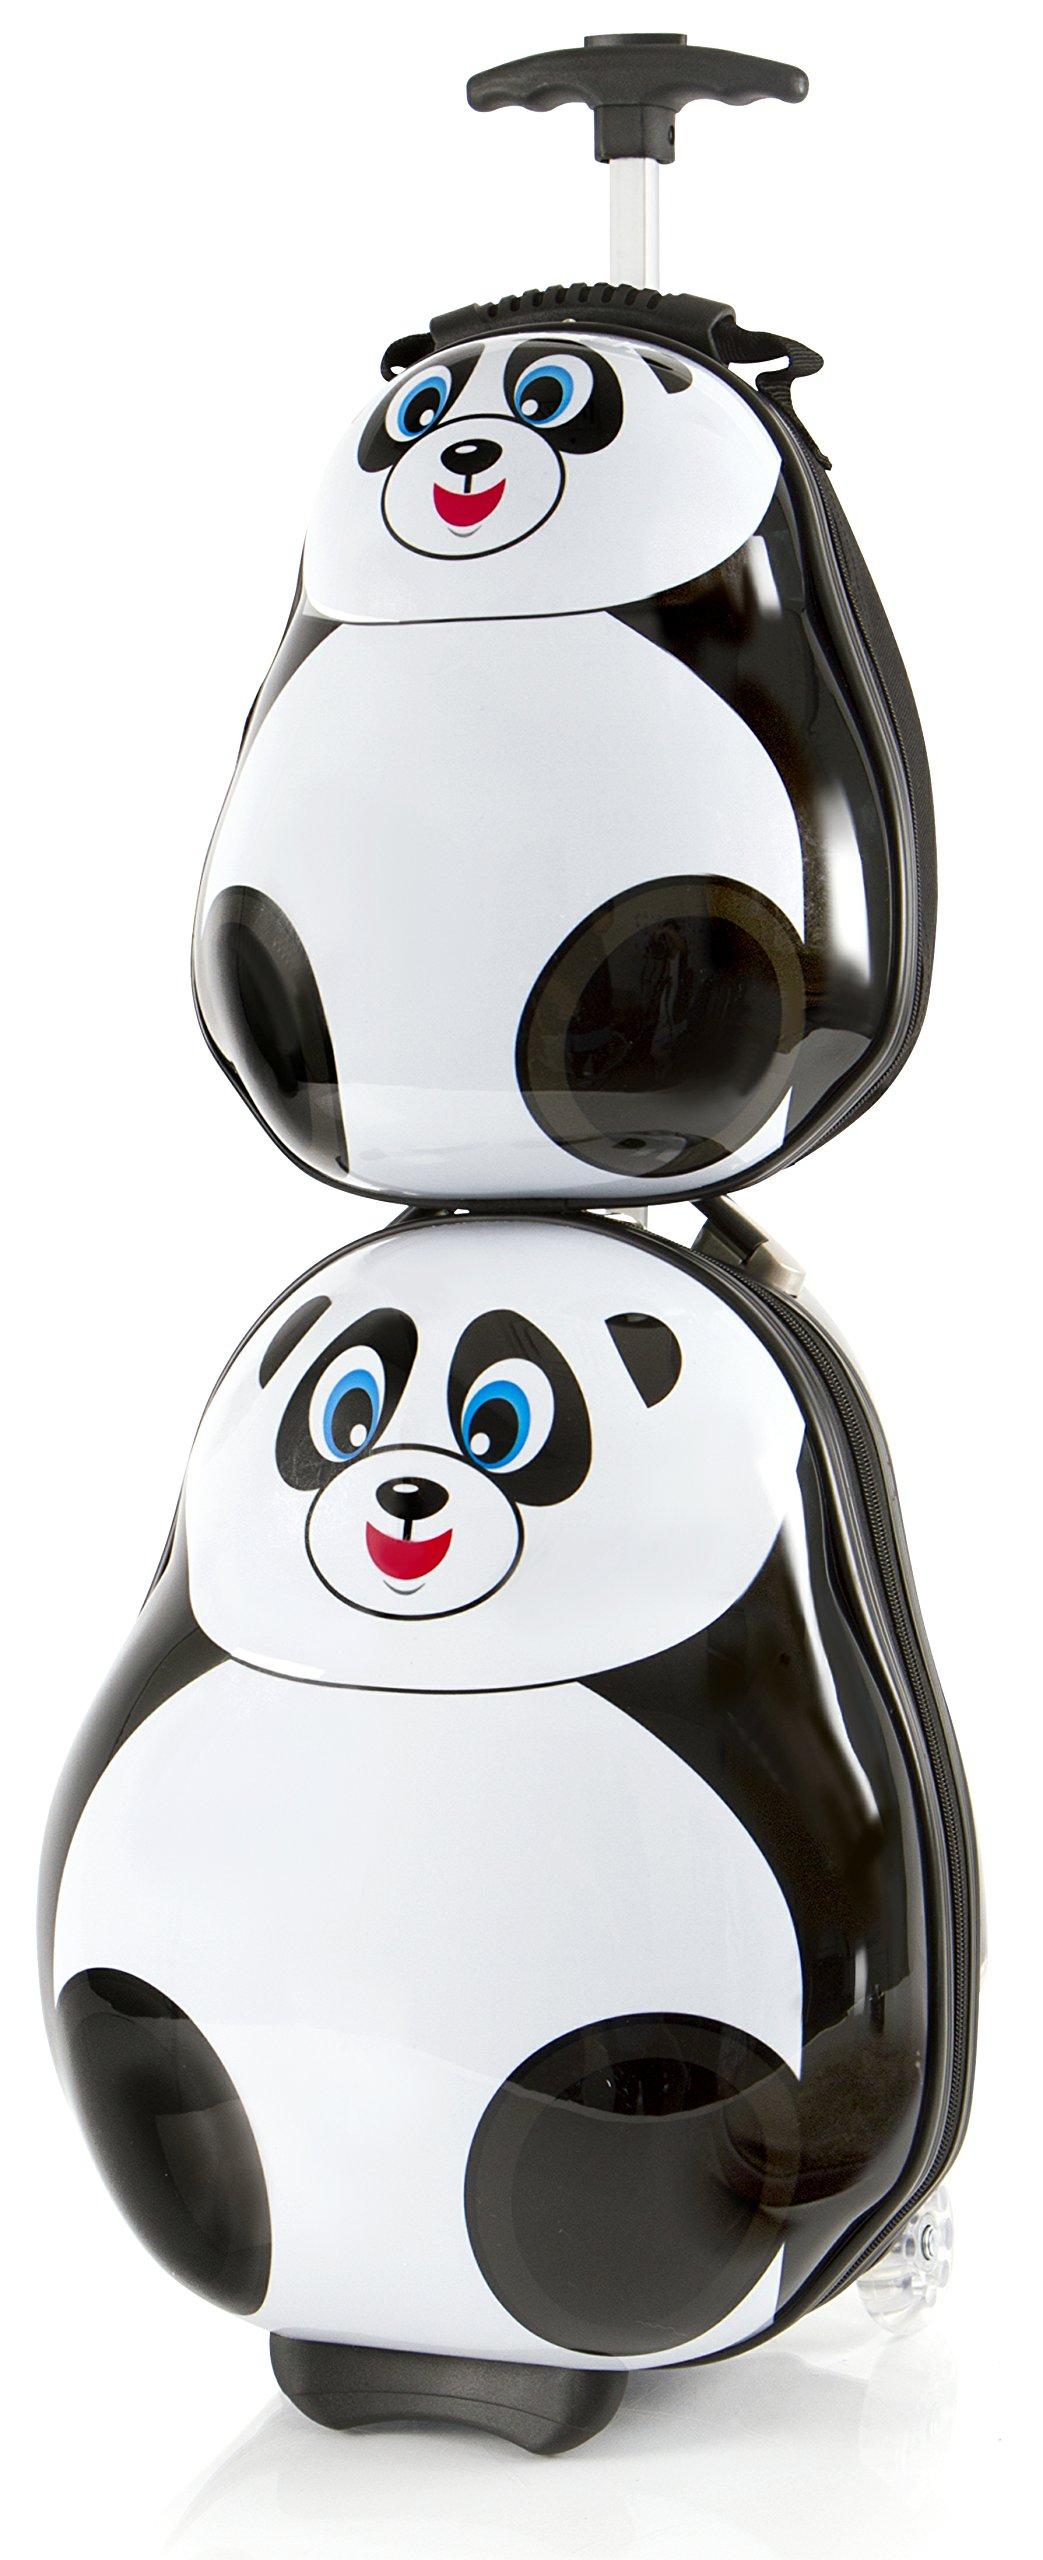 Heys America Travel Tots Kids 2 Pc Luggage Set -18'' Carry On Luggage & 13'' Backpack (Panda)